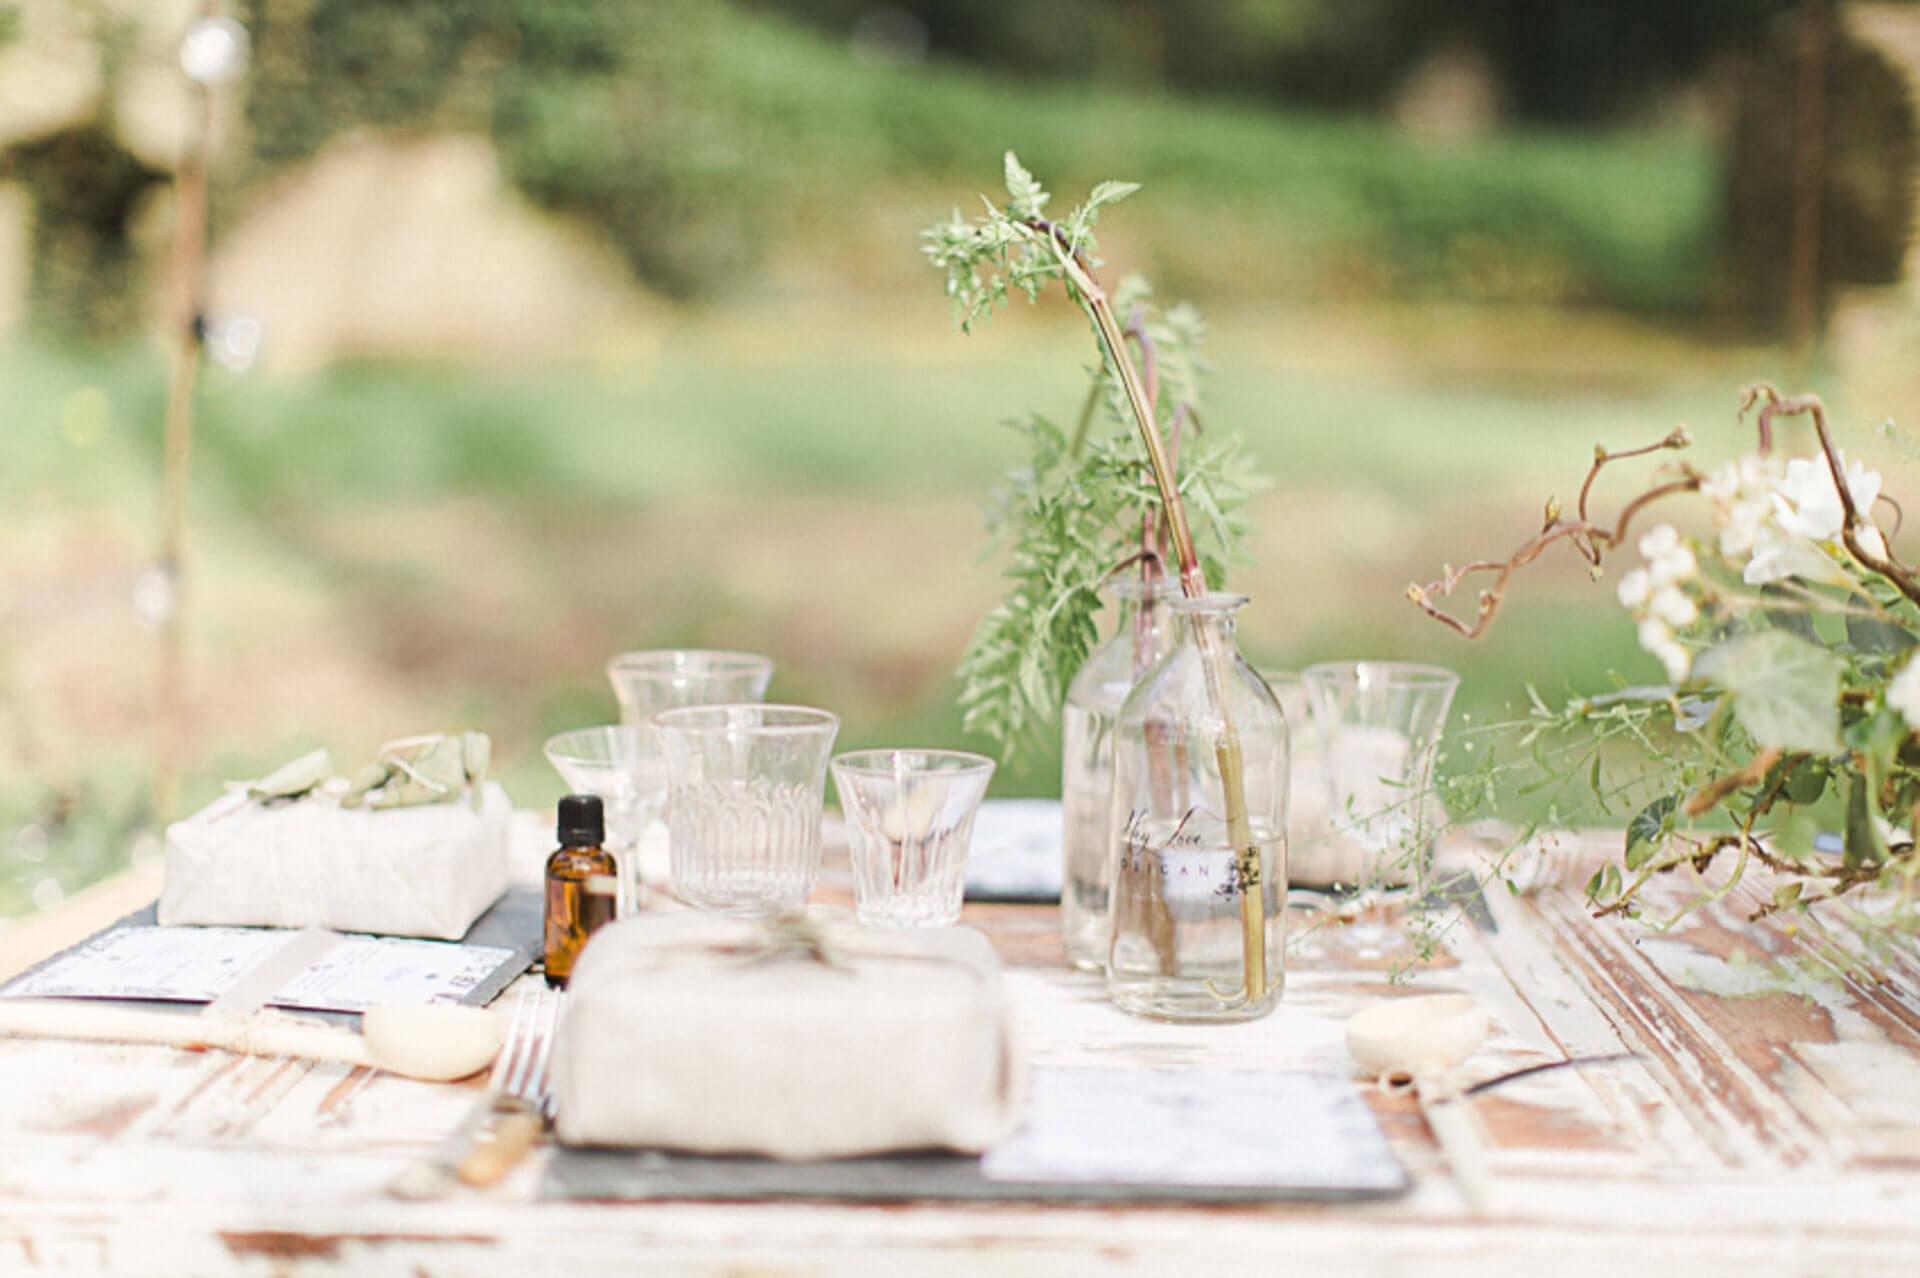 Mariage intimiste vegetal shooting inspiration jerome tarakci